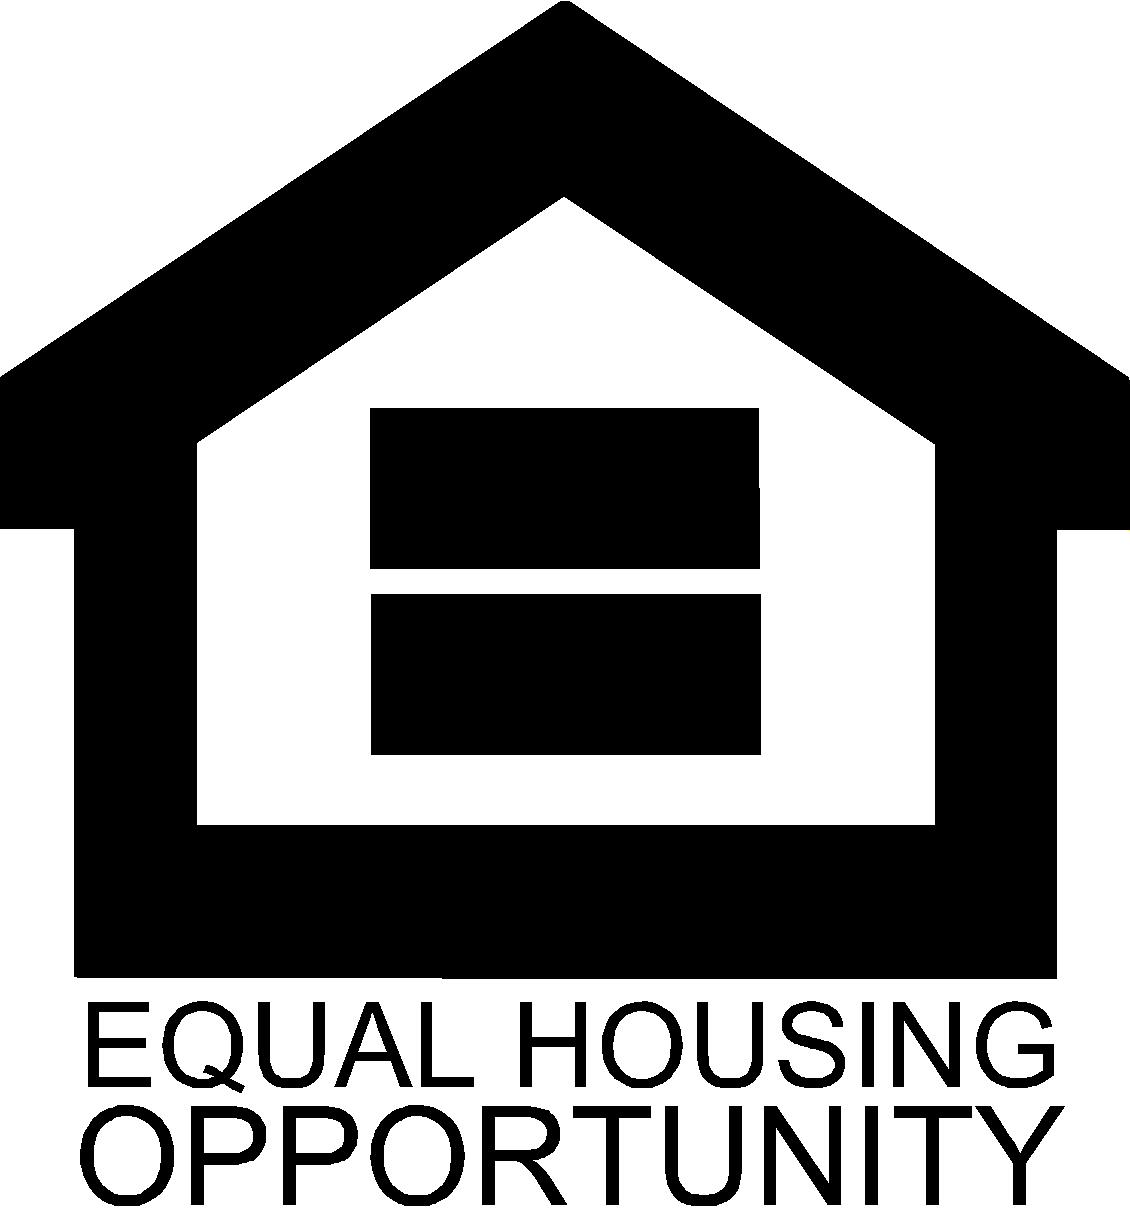 equal-housing-opportunity-logo-1200w.jpg